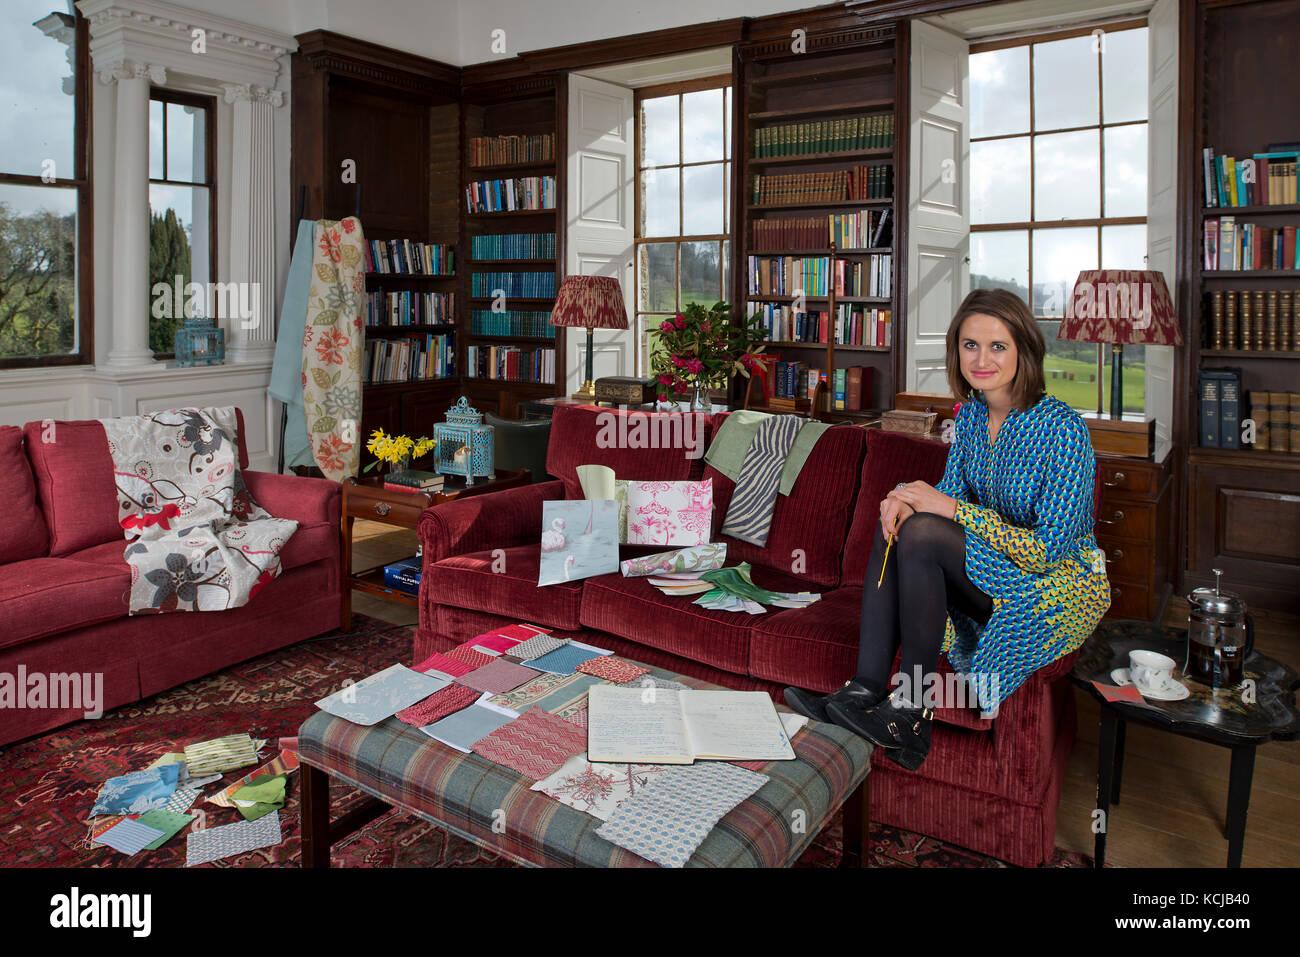 Interior Designer Stockfotos & Interior Designer Bilder - Alamy